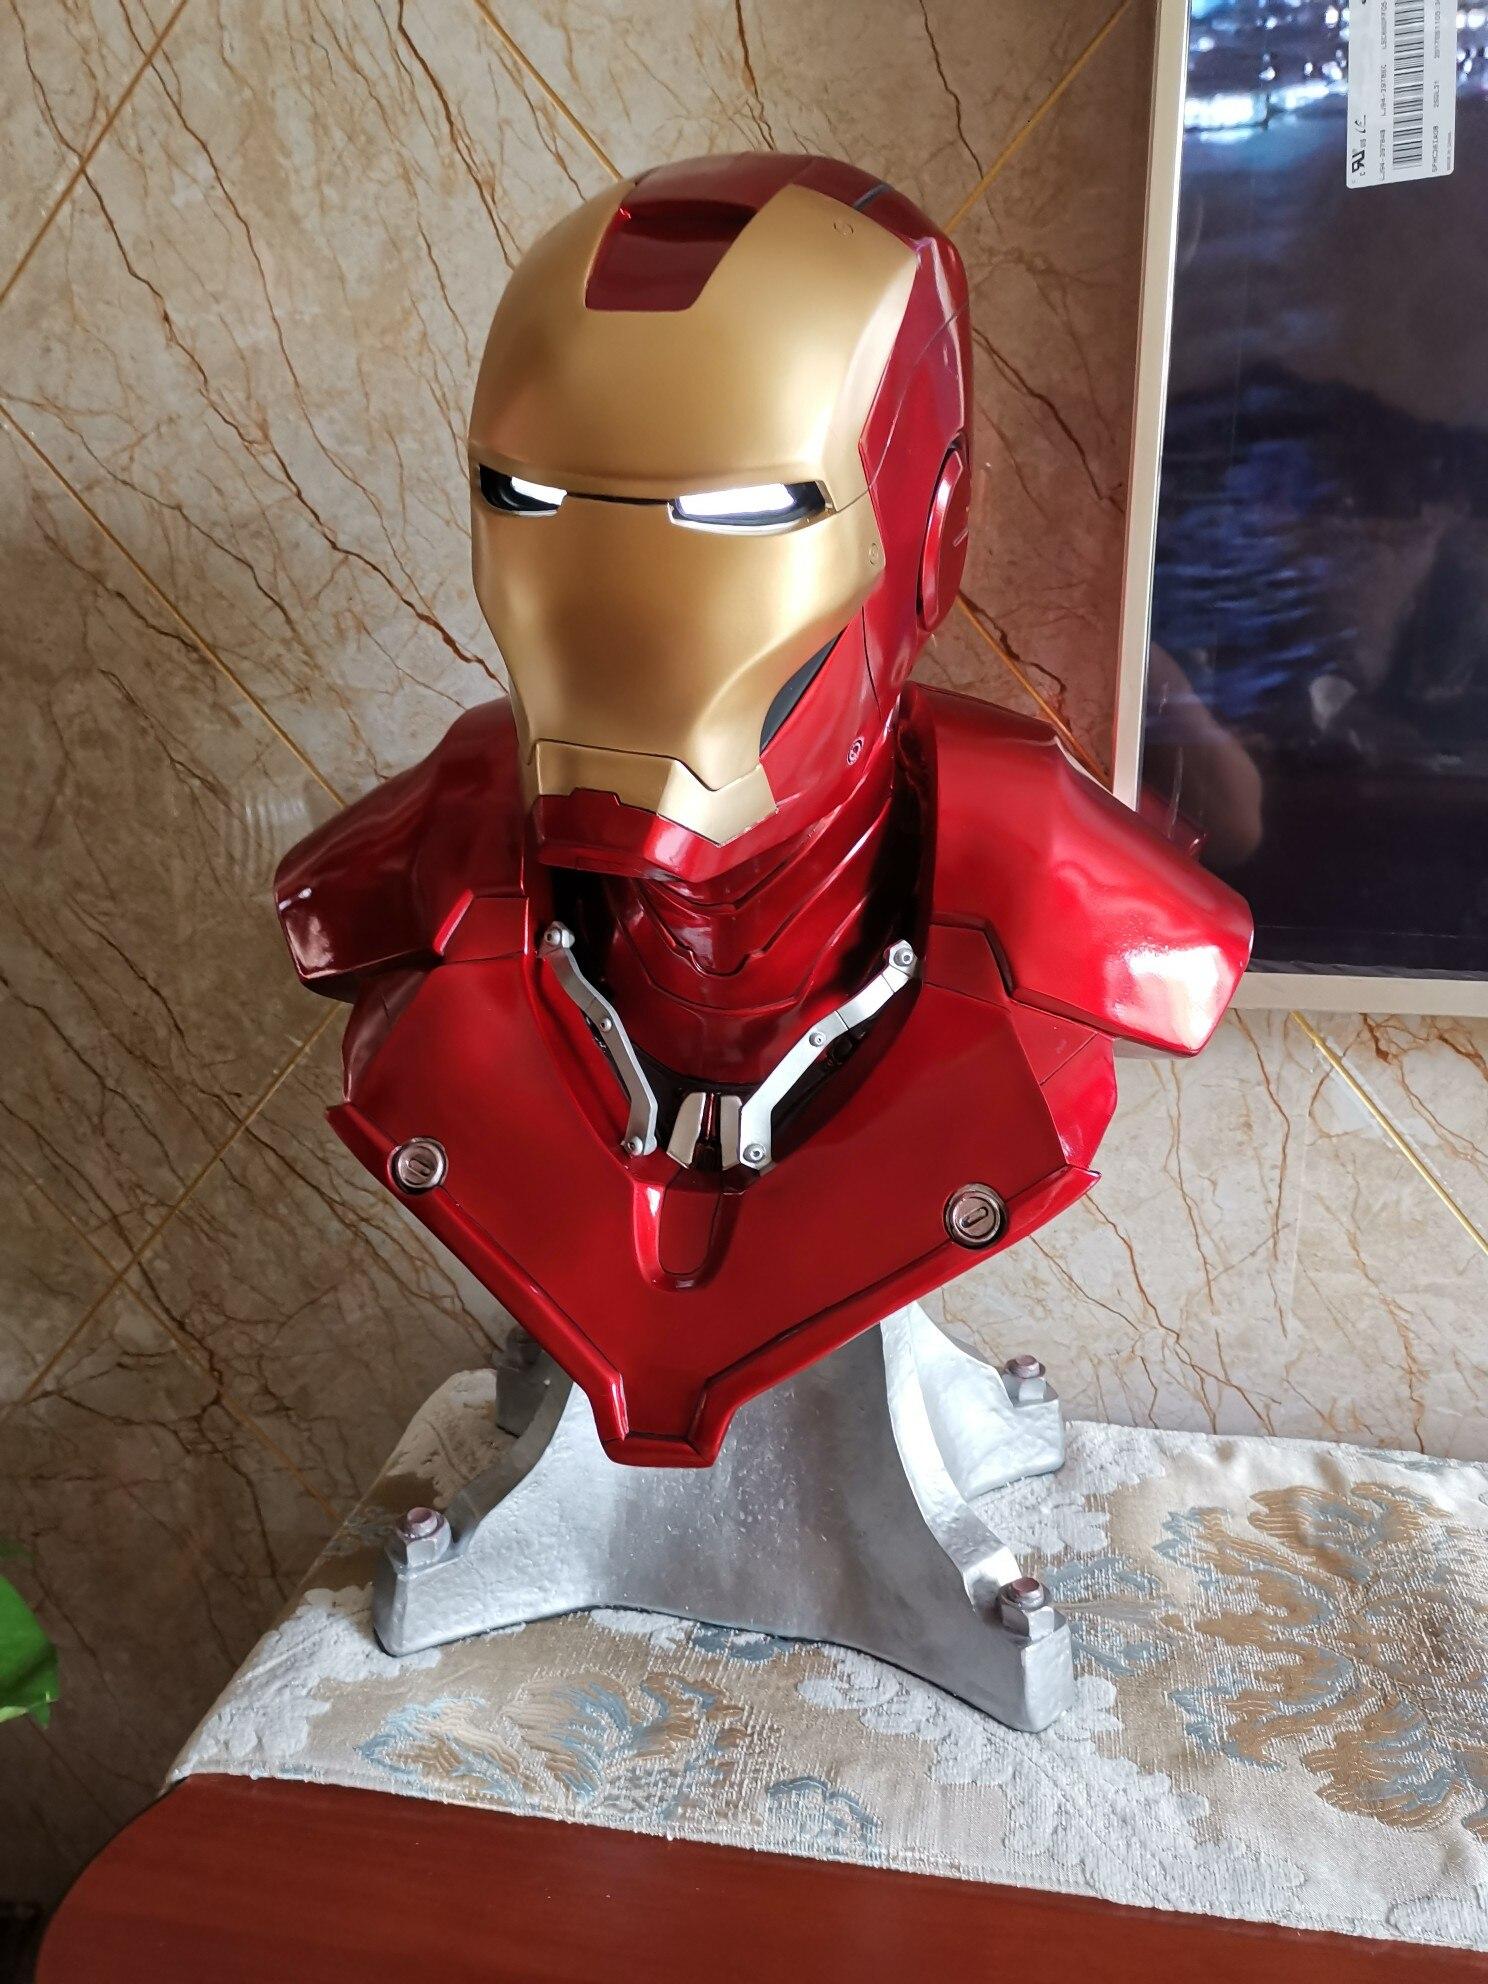 Бюст Железный Человек Марвел МК3 Светодиодный - hffd8e43e82d744cfb288cc92a96da379f